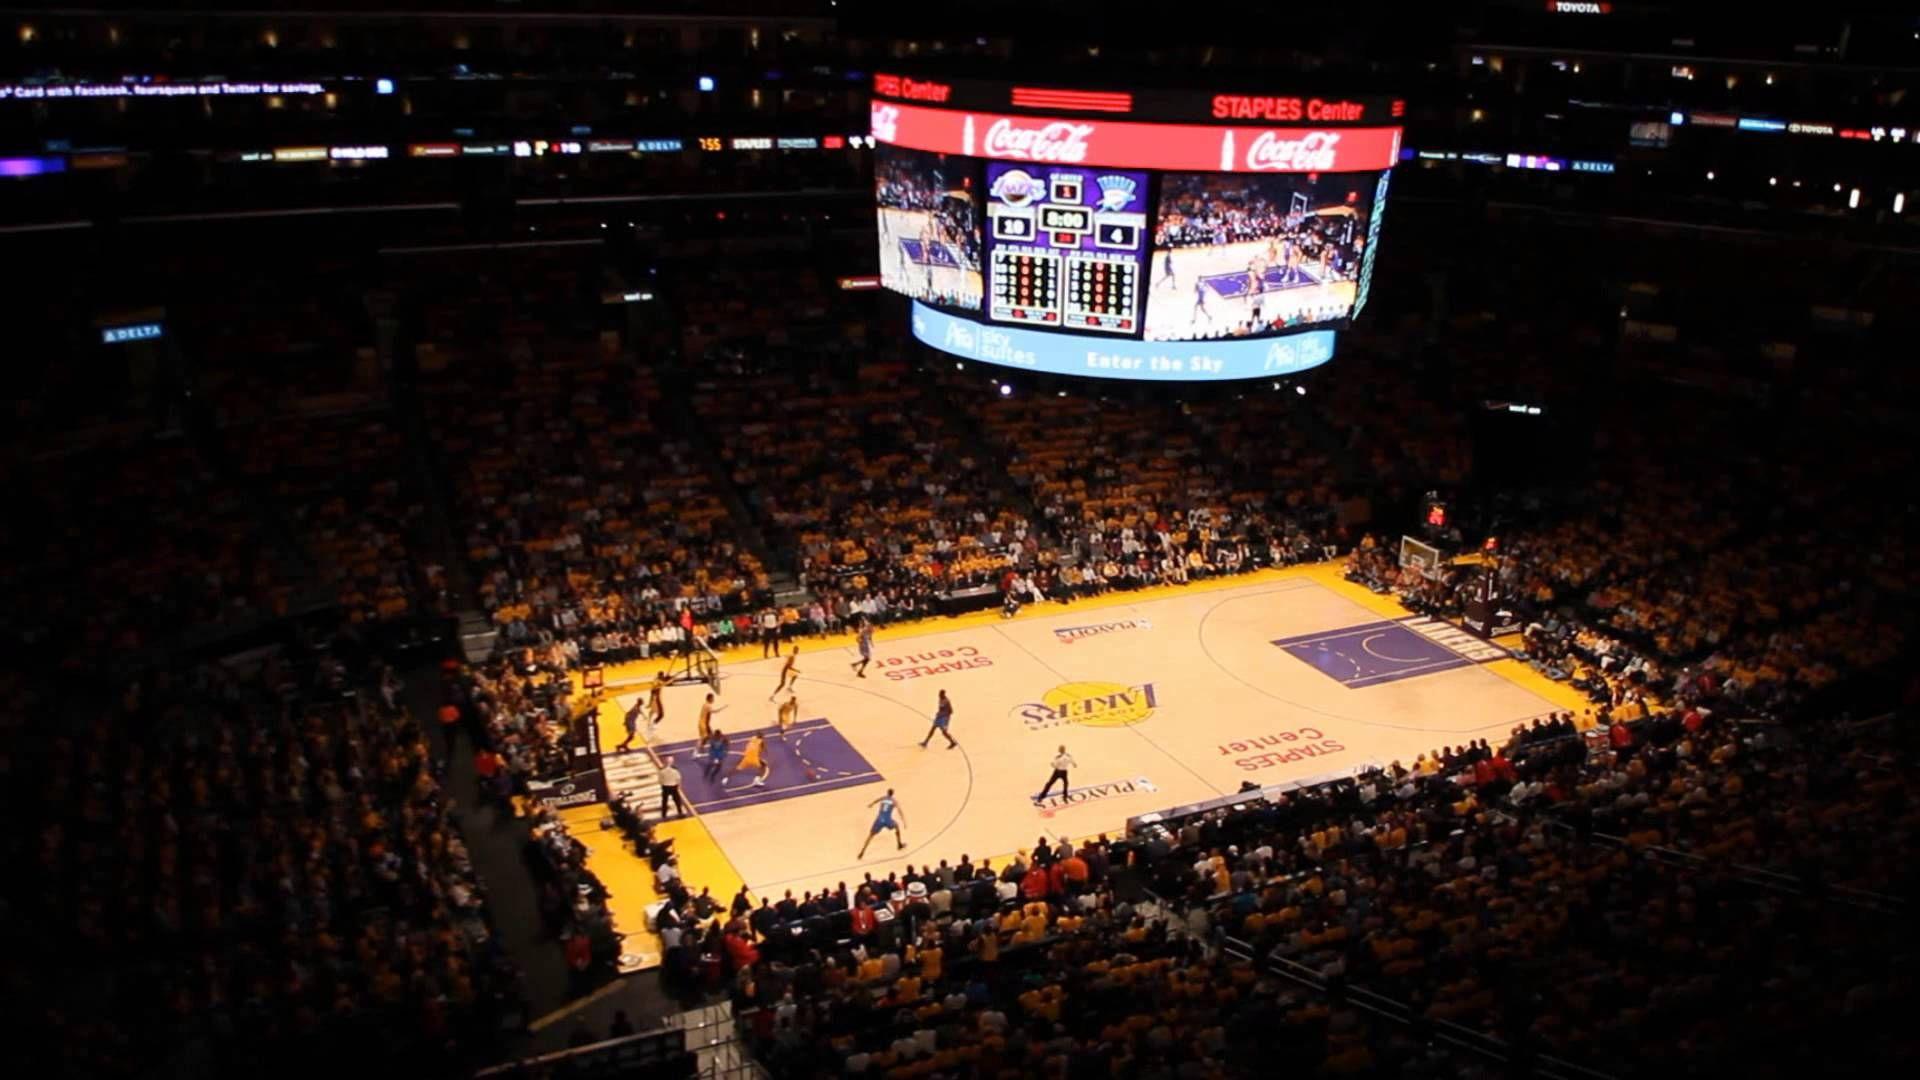 Live Stream Los Angeles Lakers Vs Minnesota Timberwolves Live Online Los Angeles Lakers Lakers Vs Minnesota Timberwolves